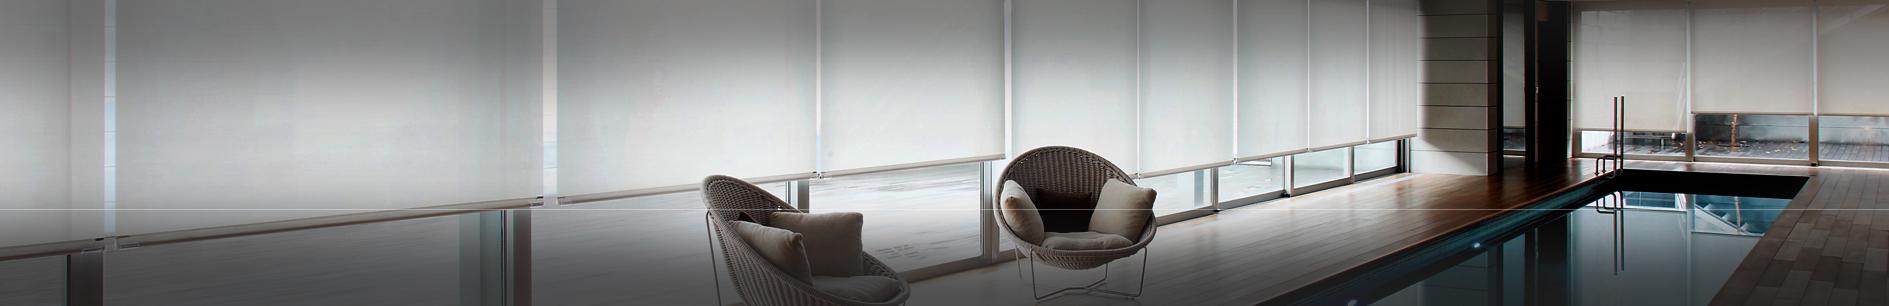 Naturales estores enrollables for Precios cortinas bandalux